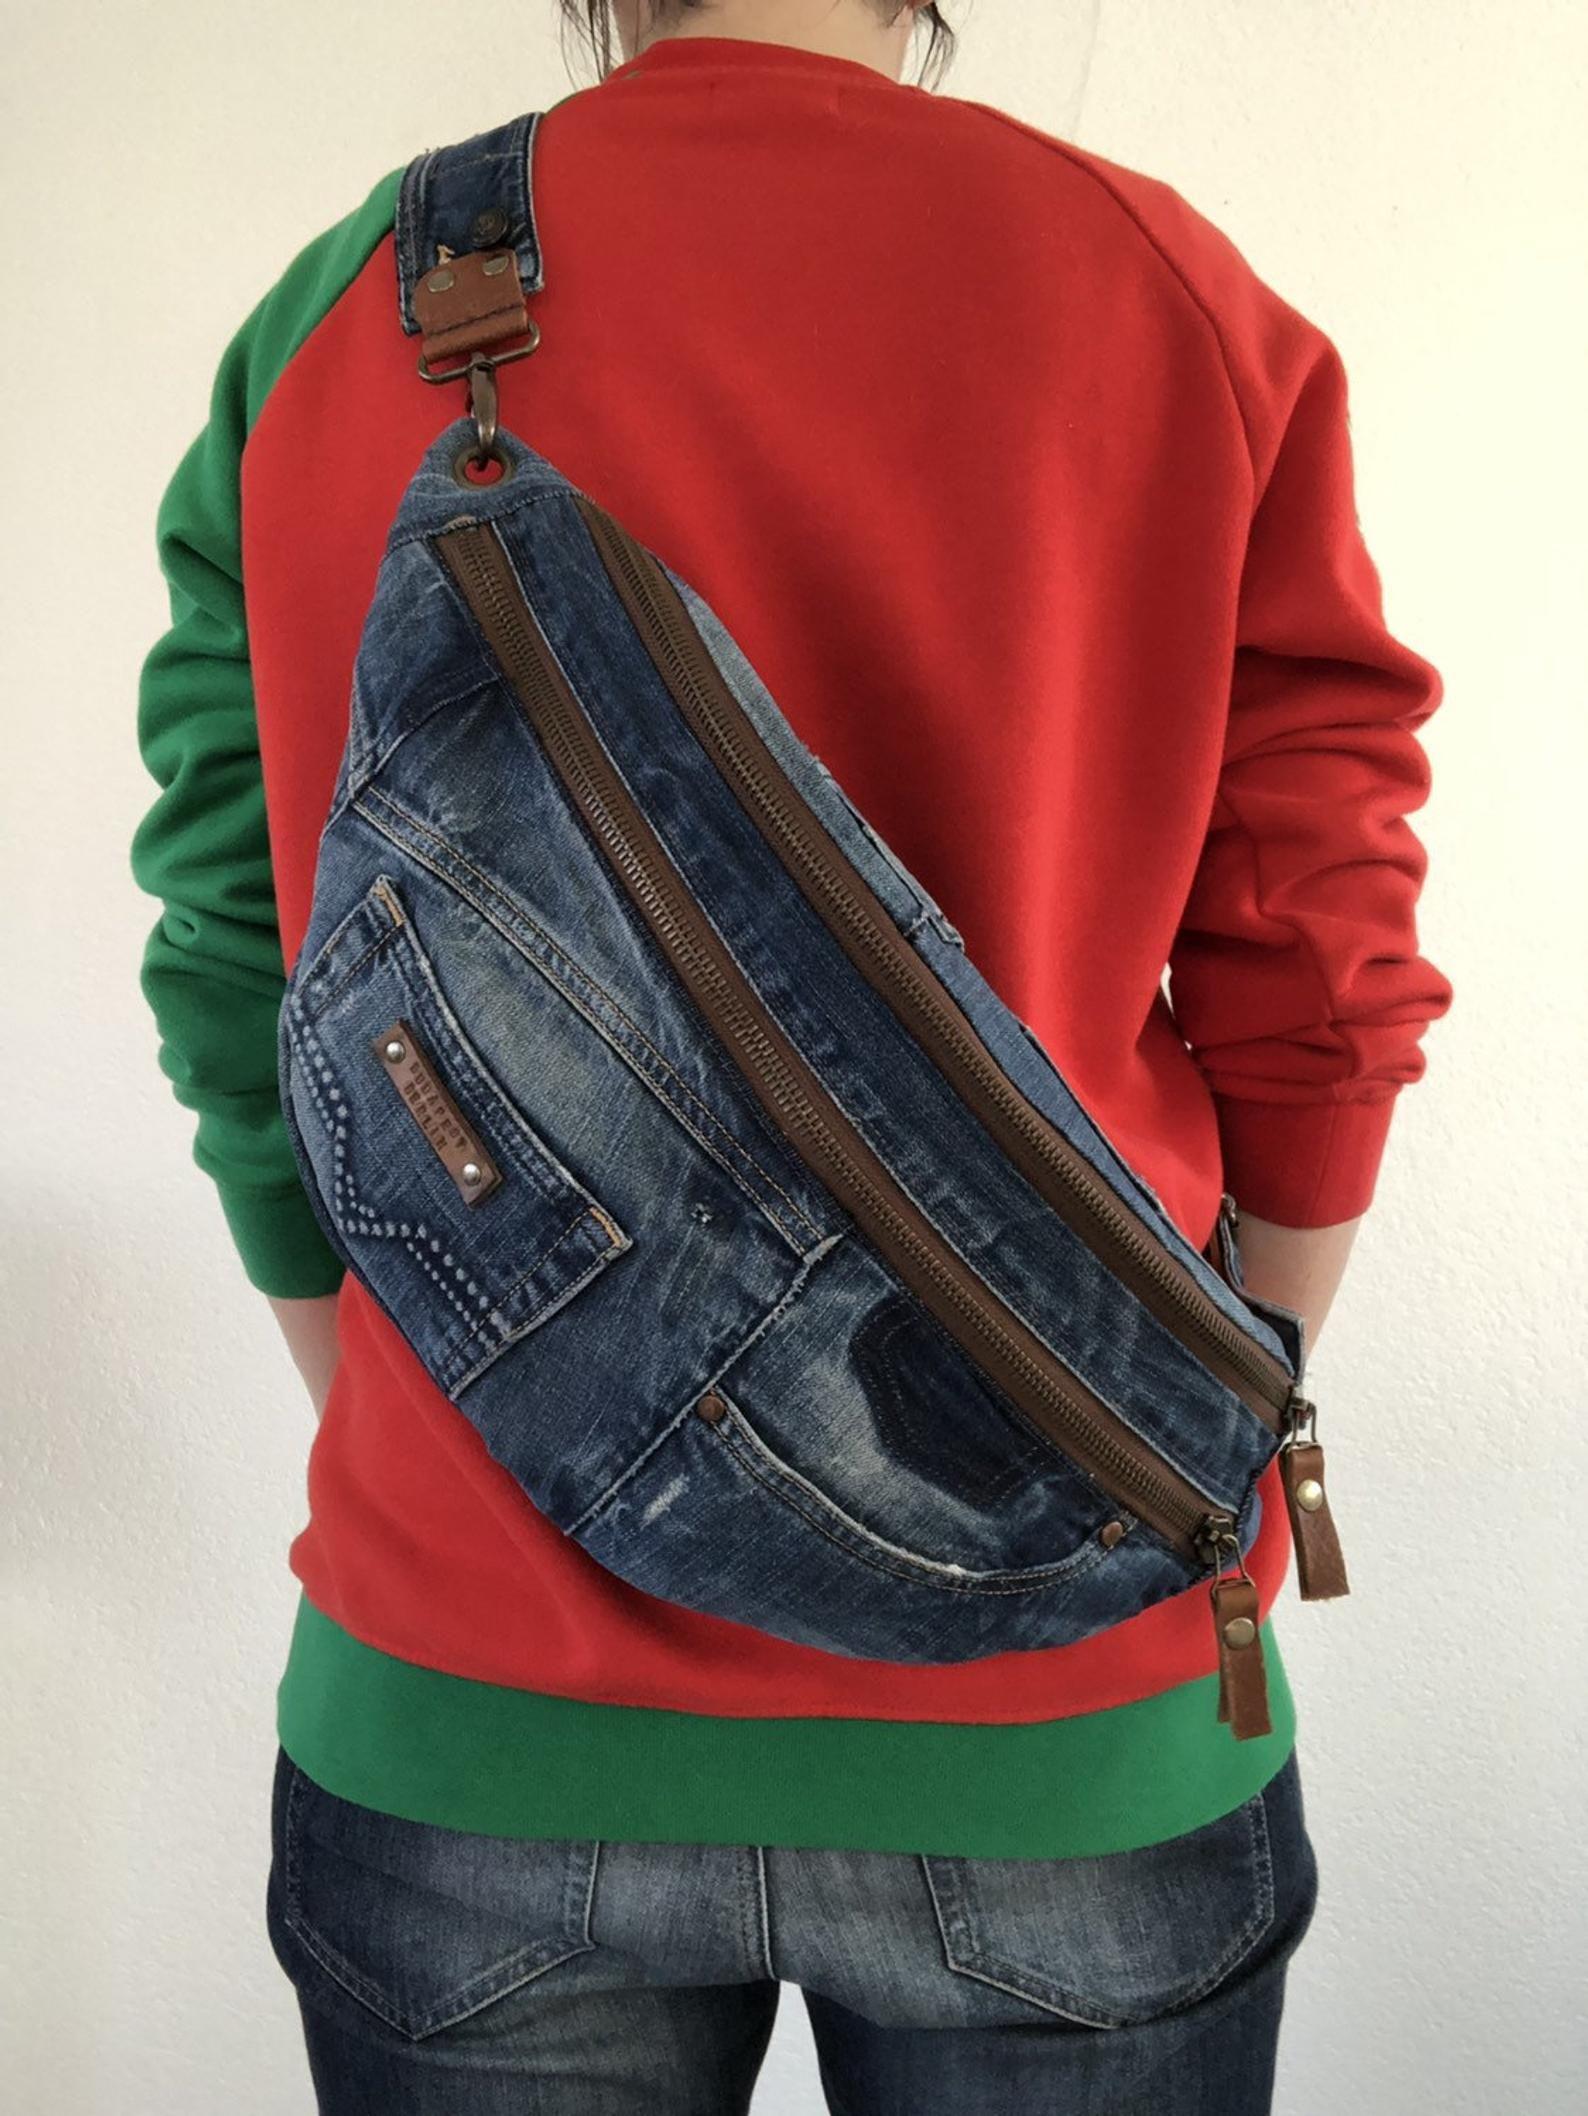 Repurposed Diesel jeans crossbody bag, hobo bag